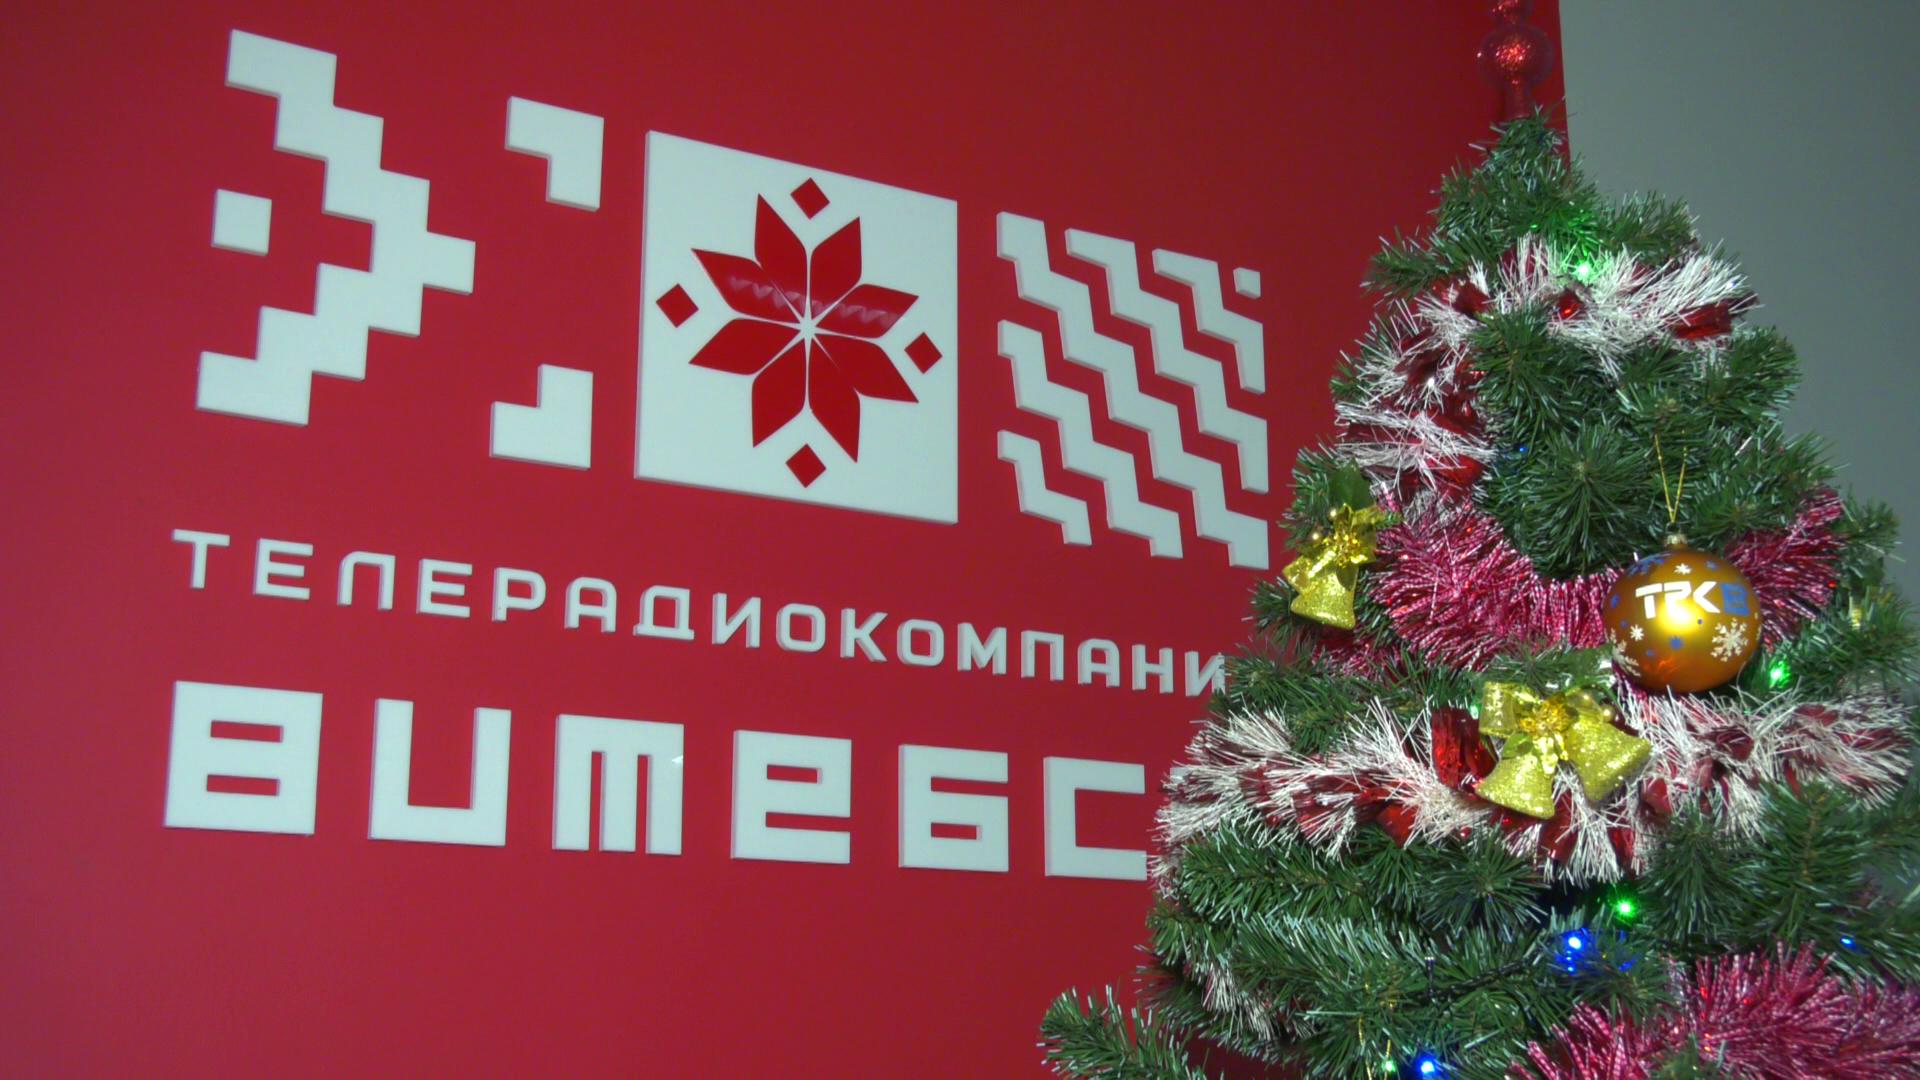 mandarinomanija 1 - «Радио Витебск» раздаёт новогодние подарки (видео)